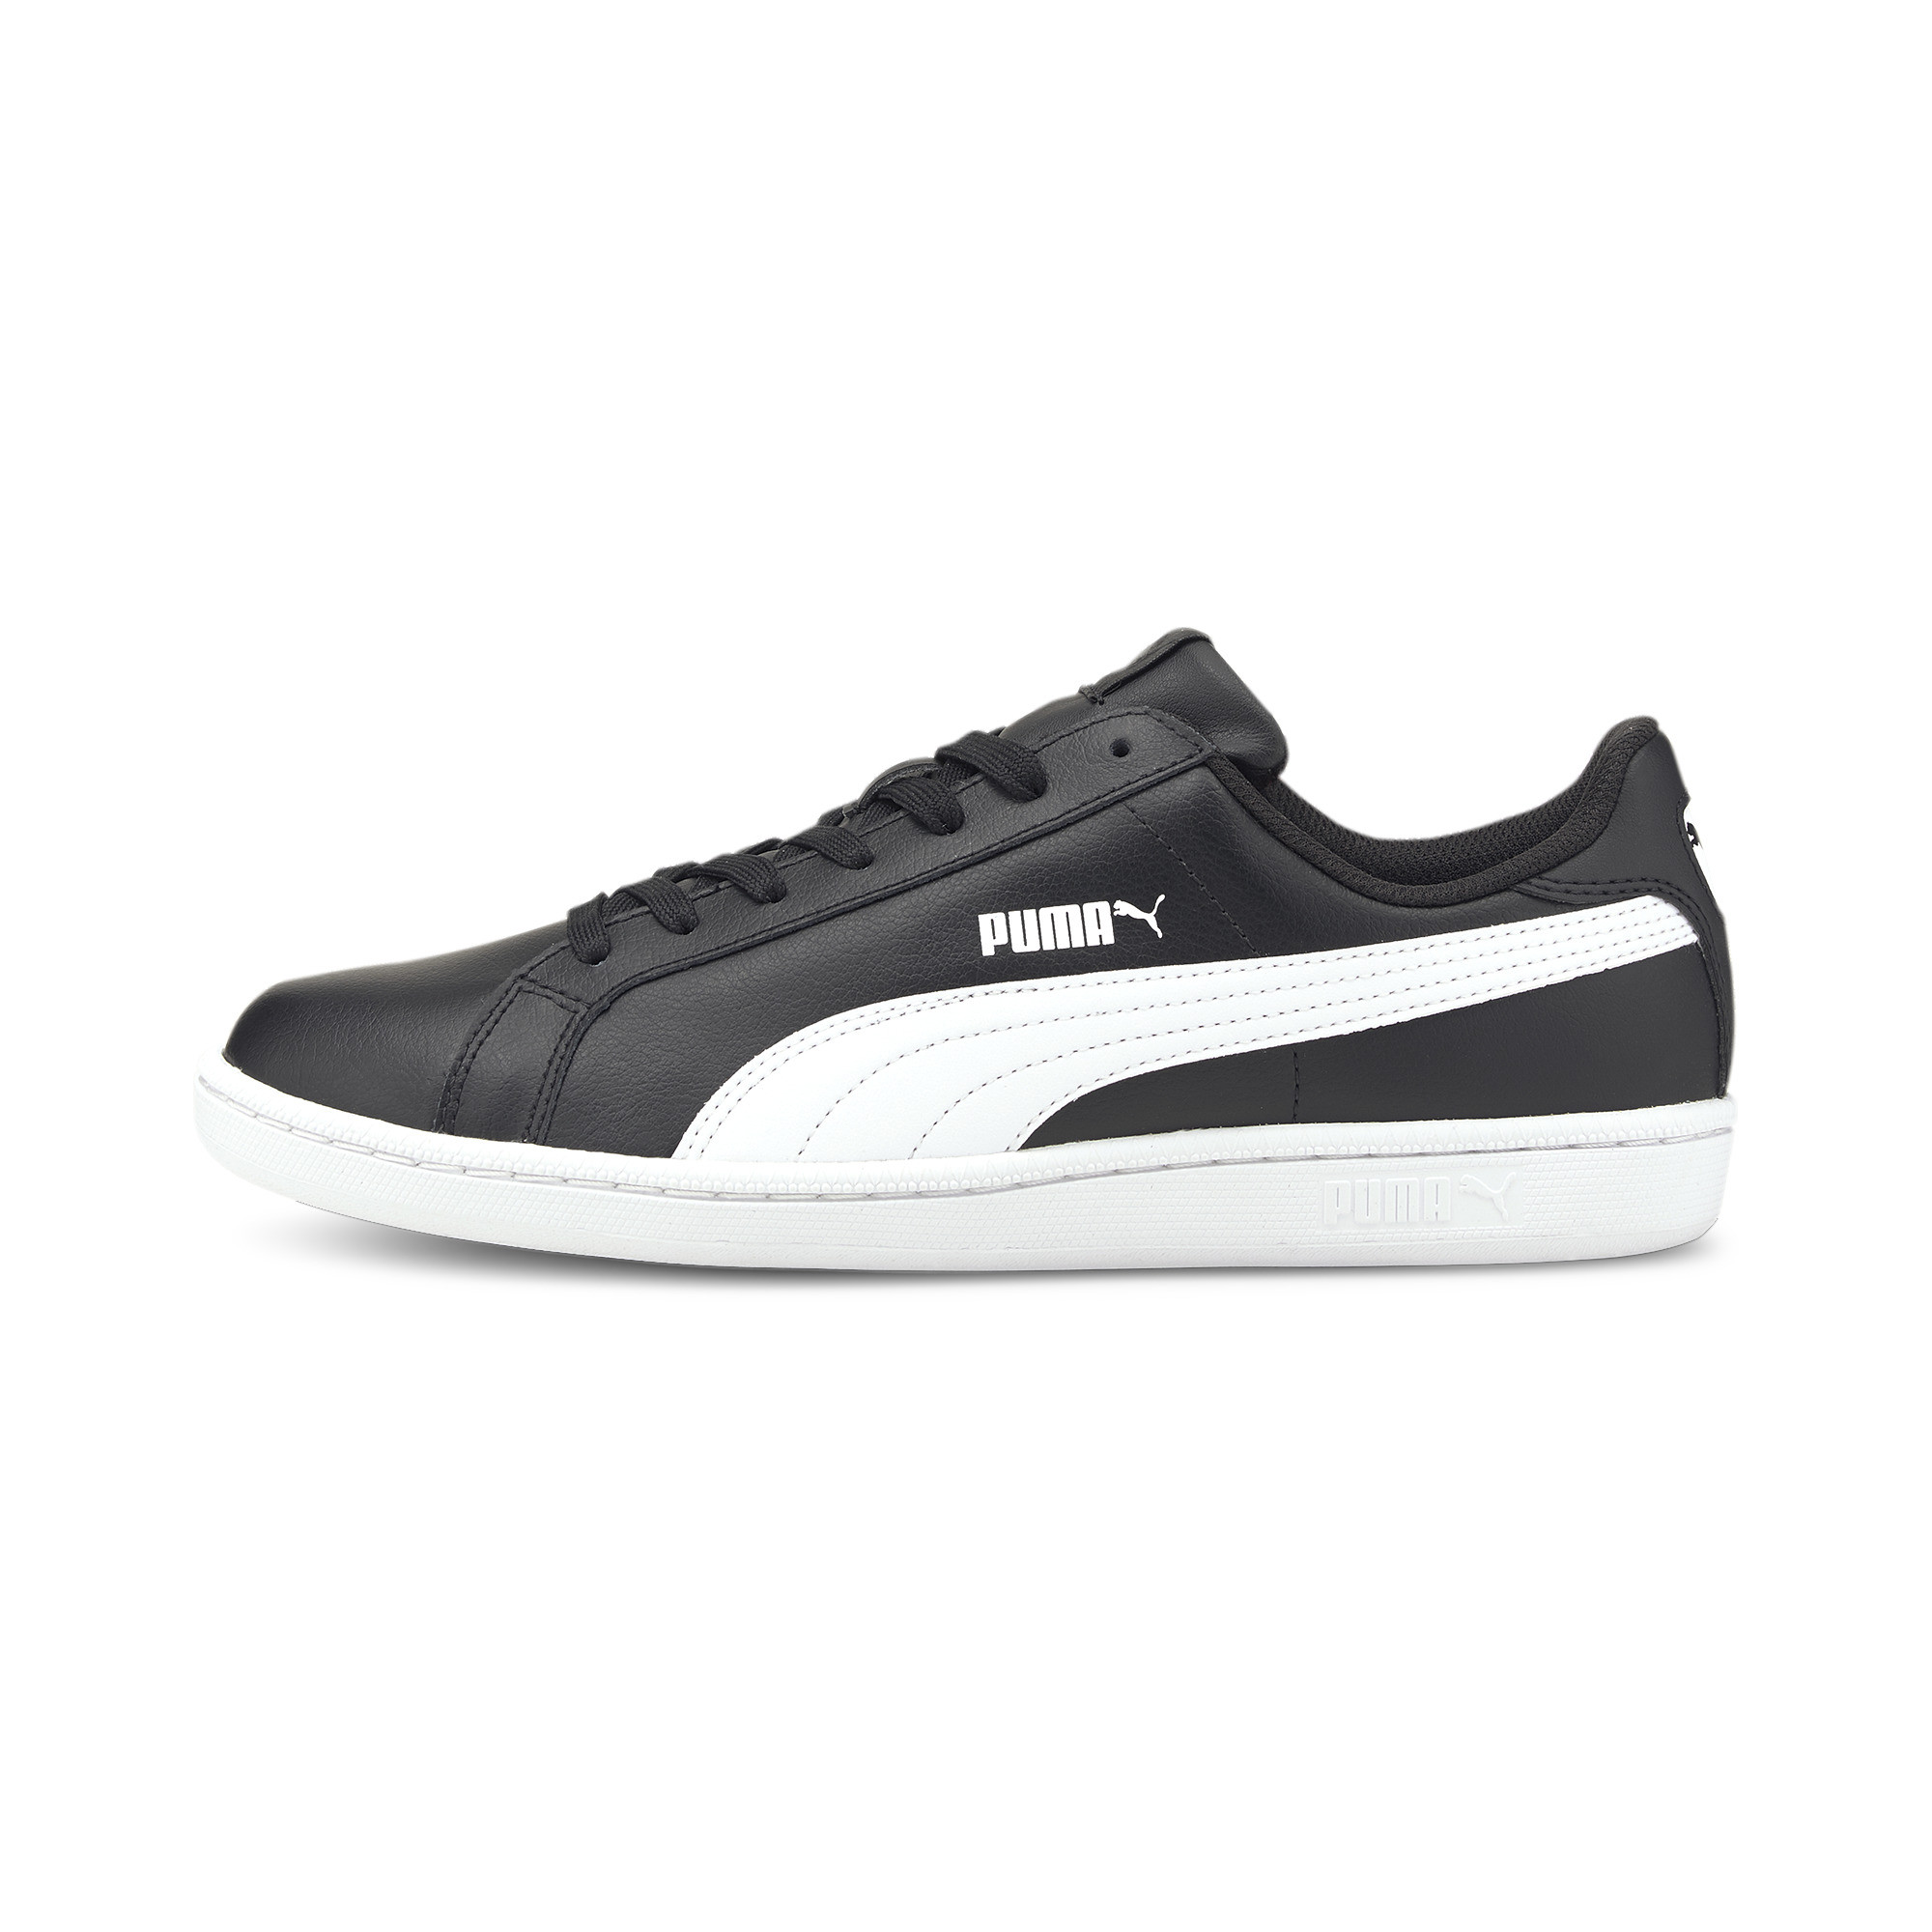 Indexbild 19 - PUMA Smash Trainers Schuhe Sneakers Sport Classics Unisex Neu